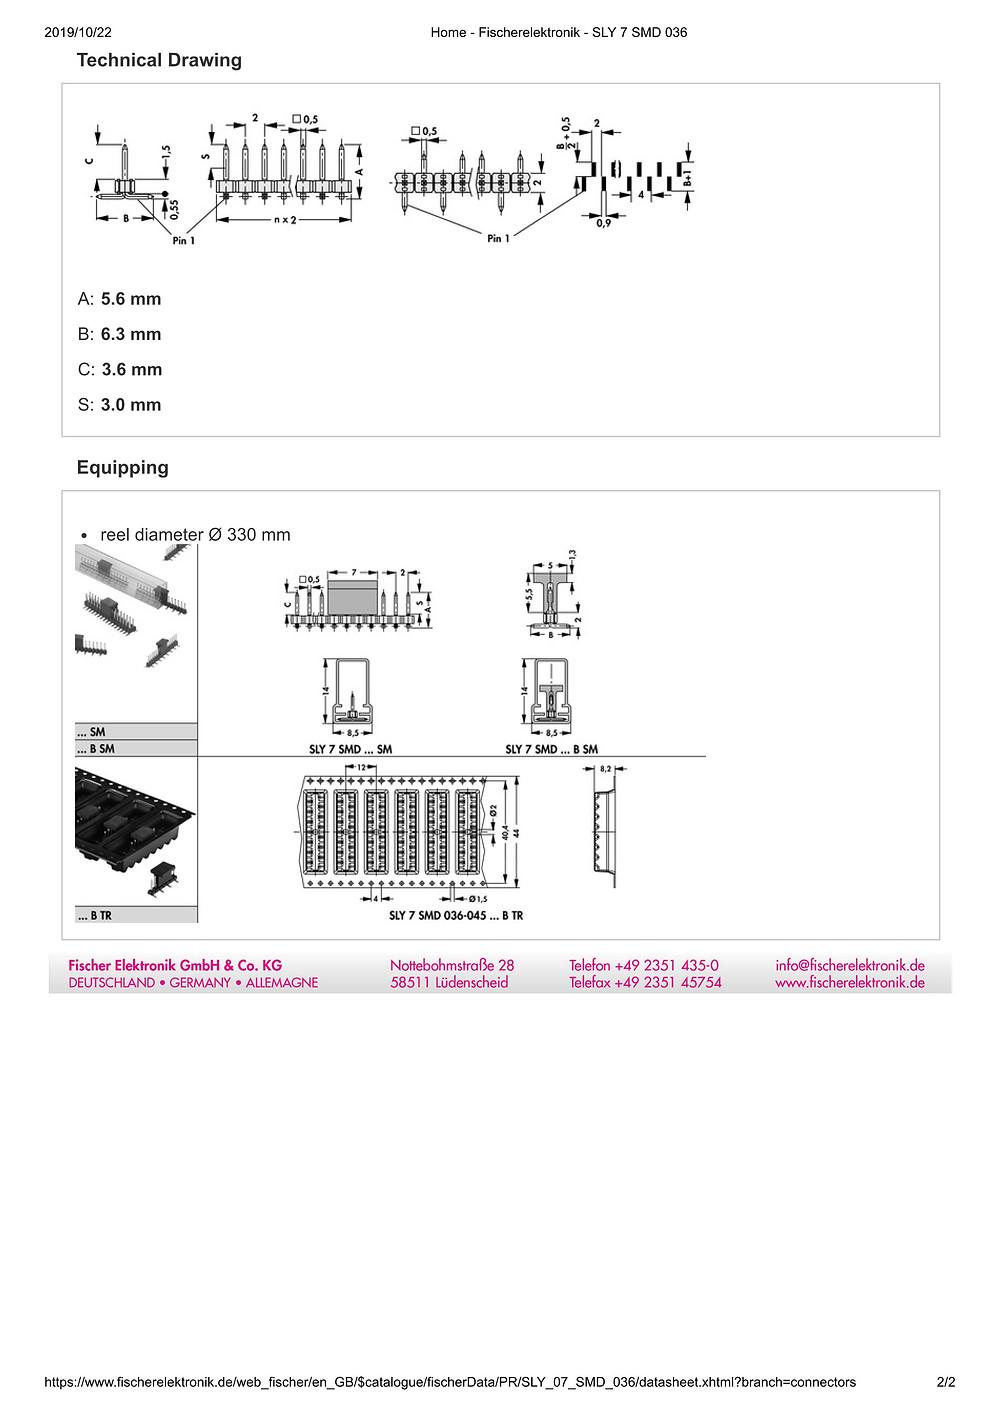 SLY 7 SMD 036 フィッシャー テープ&リール対応 ピンヘッダ 1列 2㎜ピッチ □0.5mm (1リール=650個巻)4-15ピン